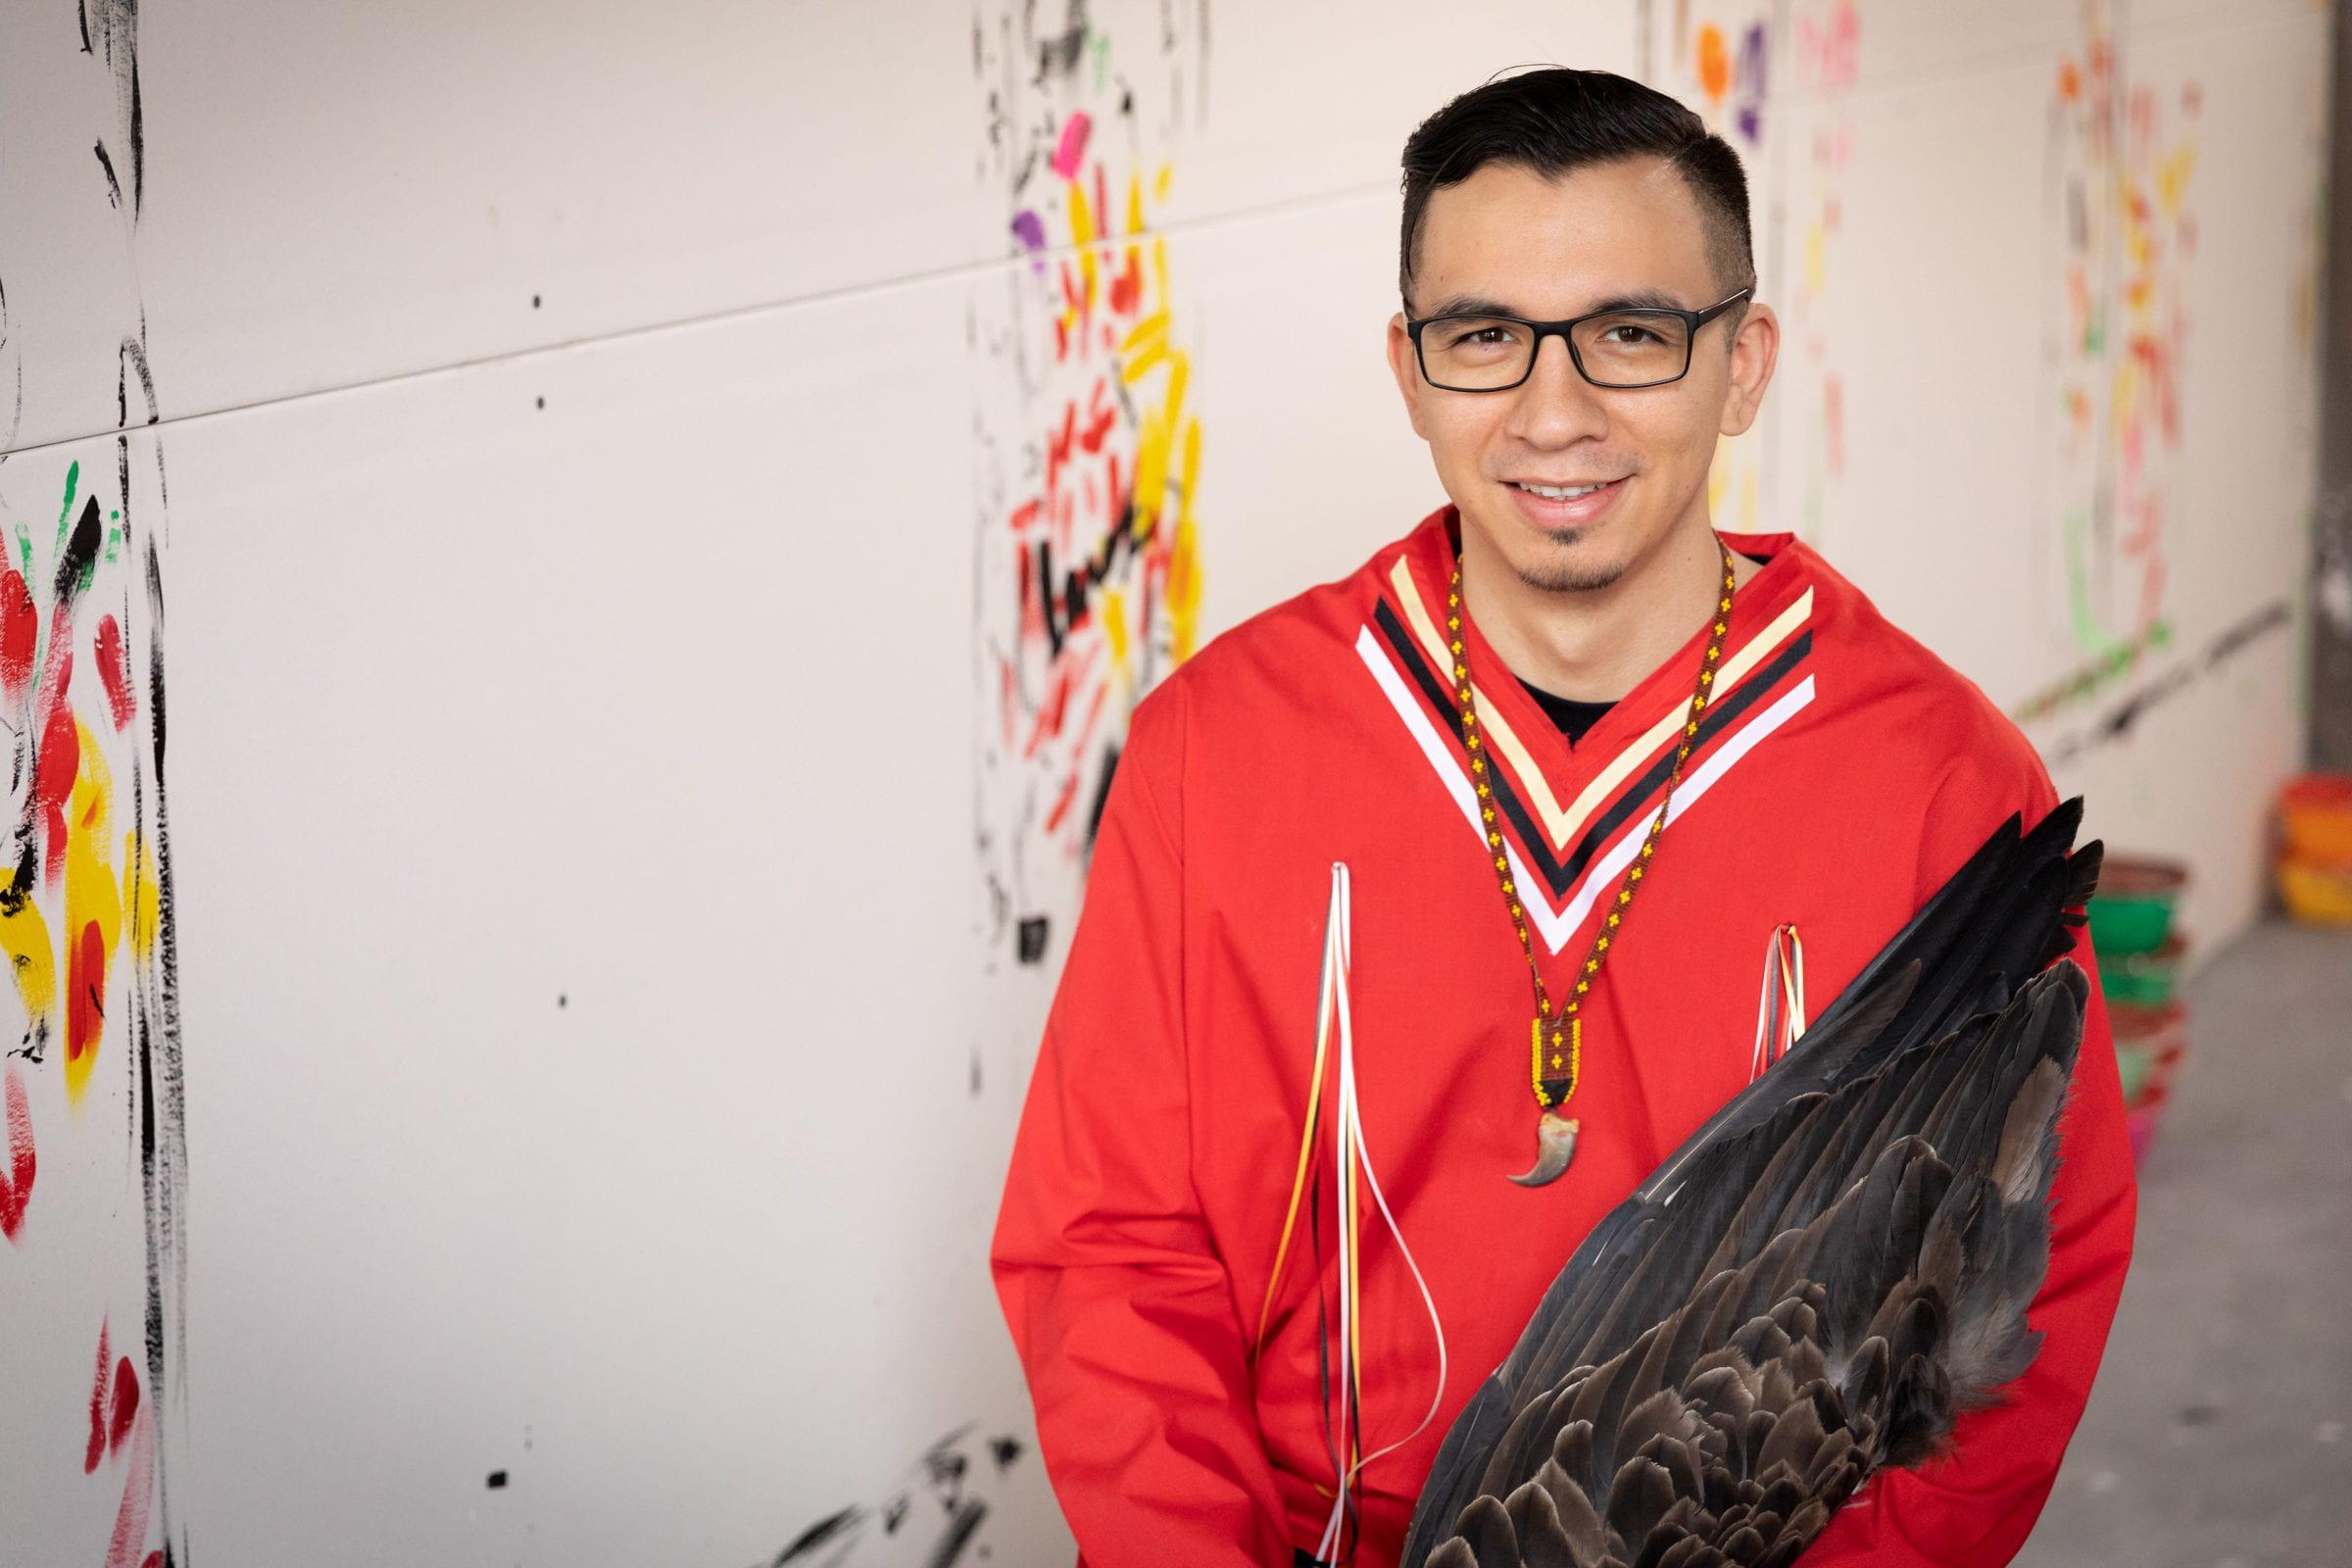 RRC grad and Winnipeg artist Jordan Stranger